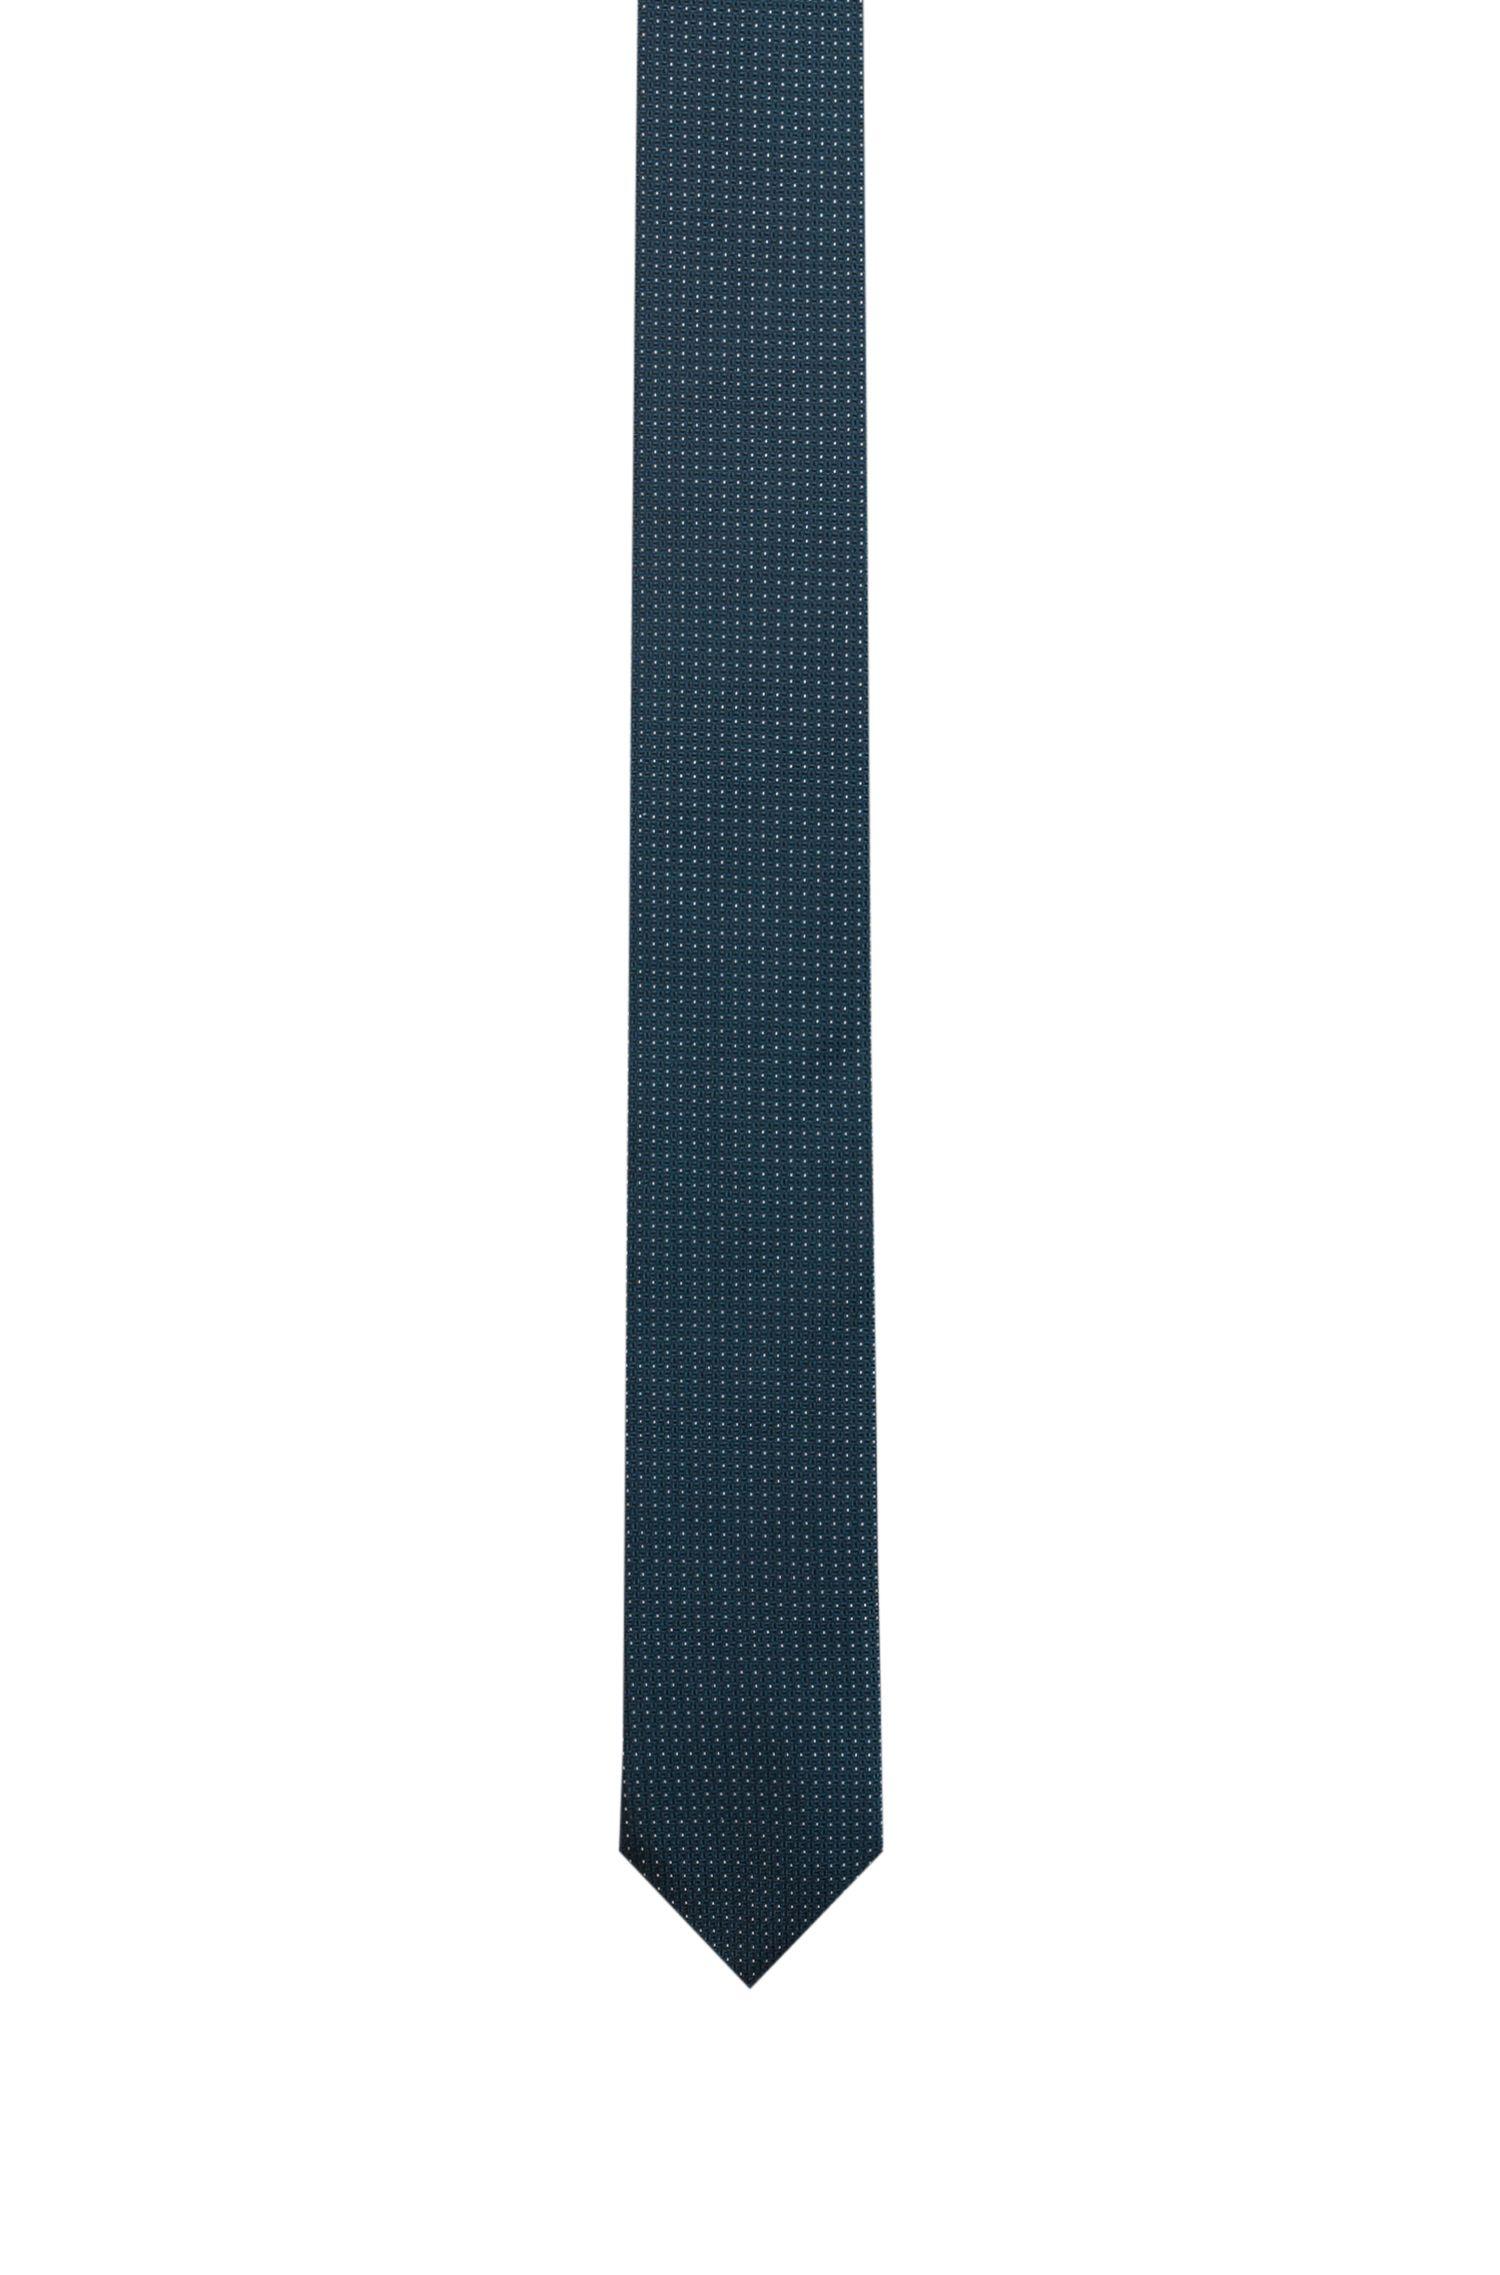 Corbata de jacquard en seda con microestampado, Verde oscuro